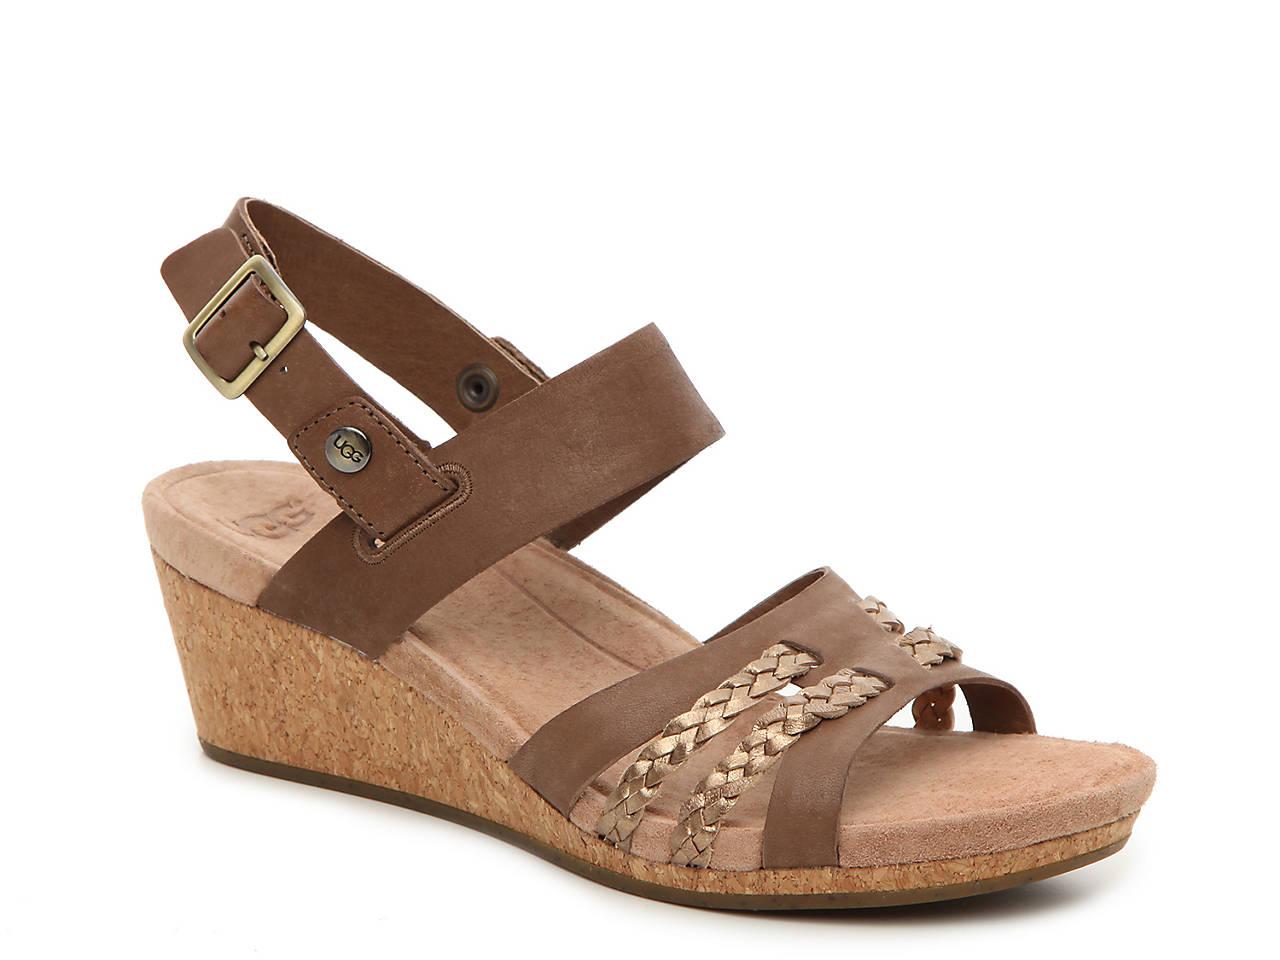 8e6f302c554 Serinda Wedge Sandal